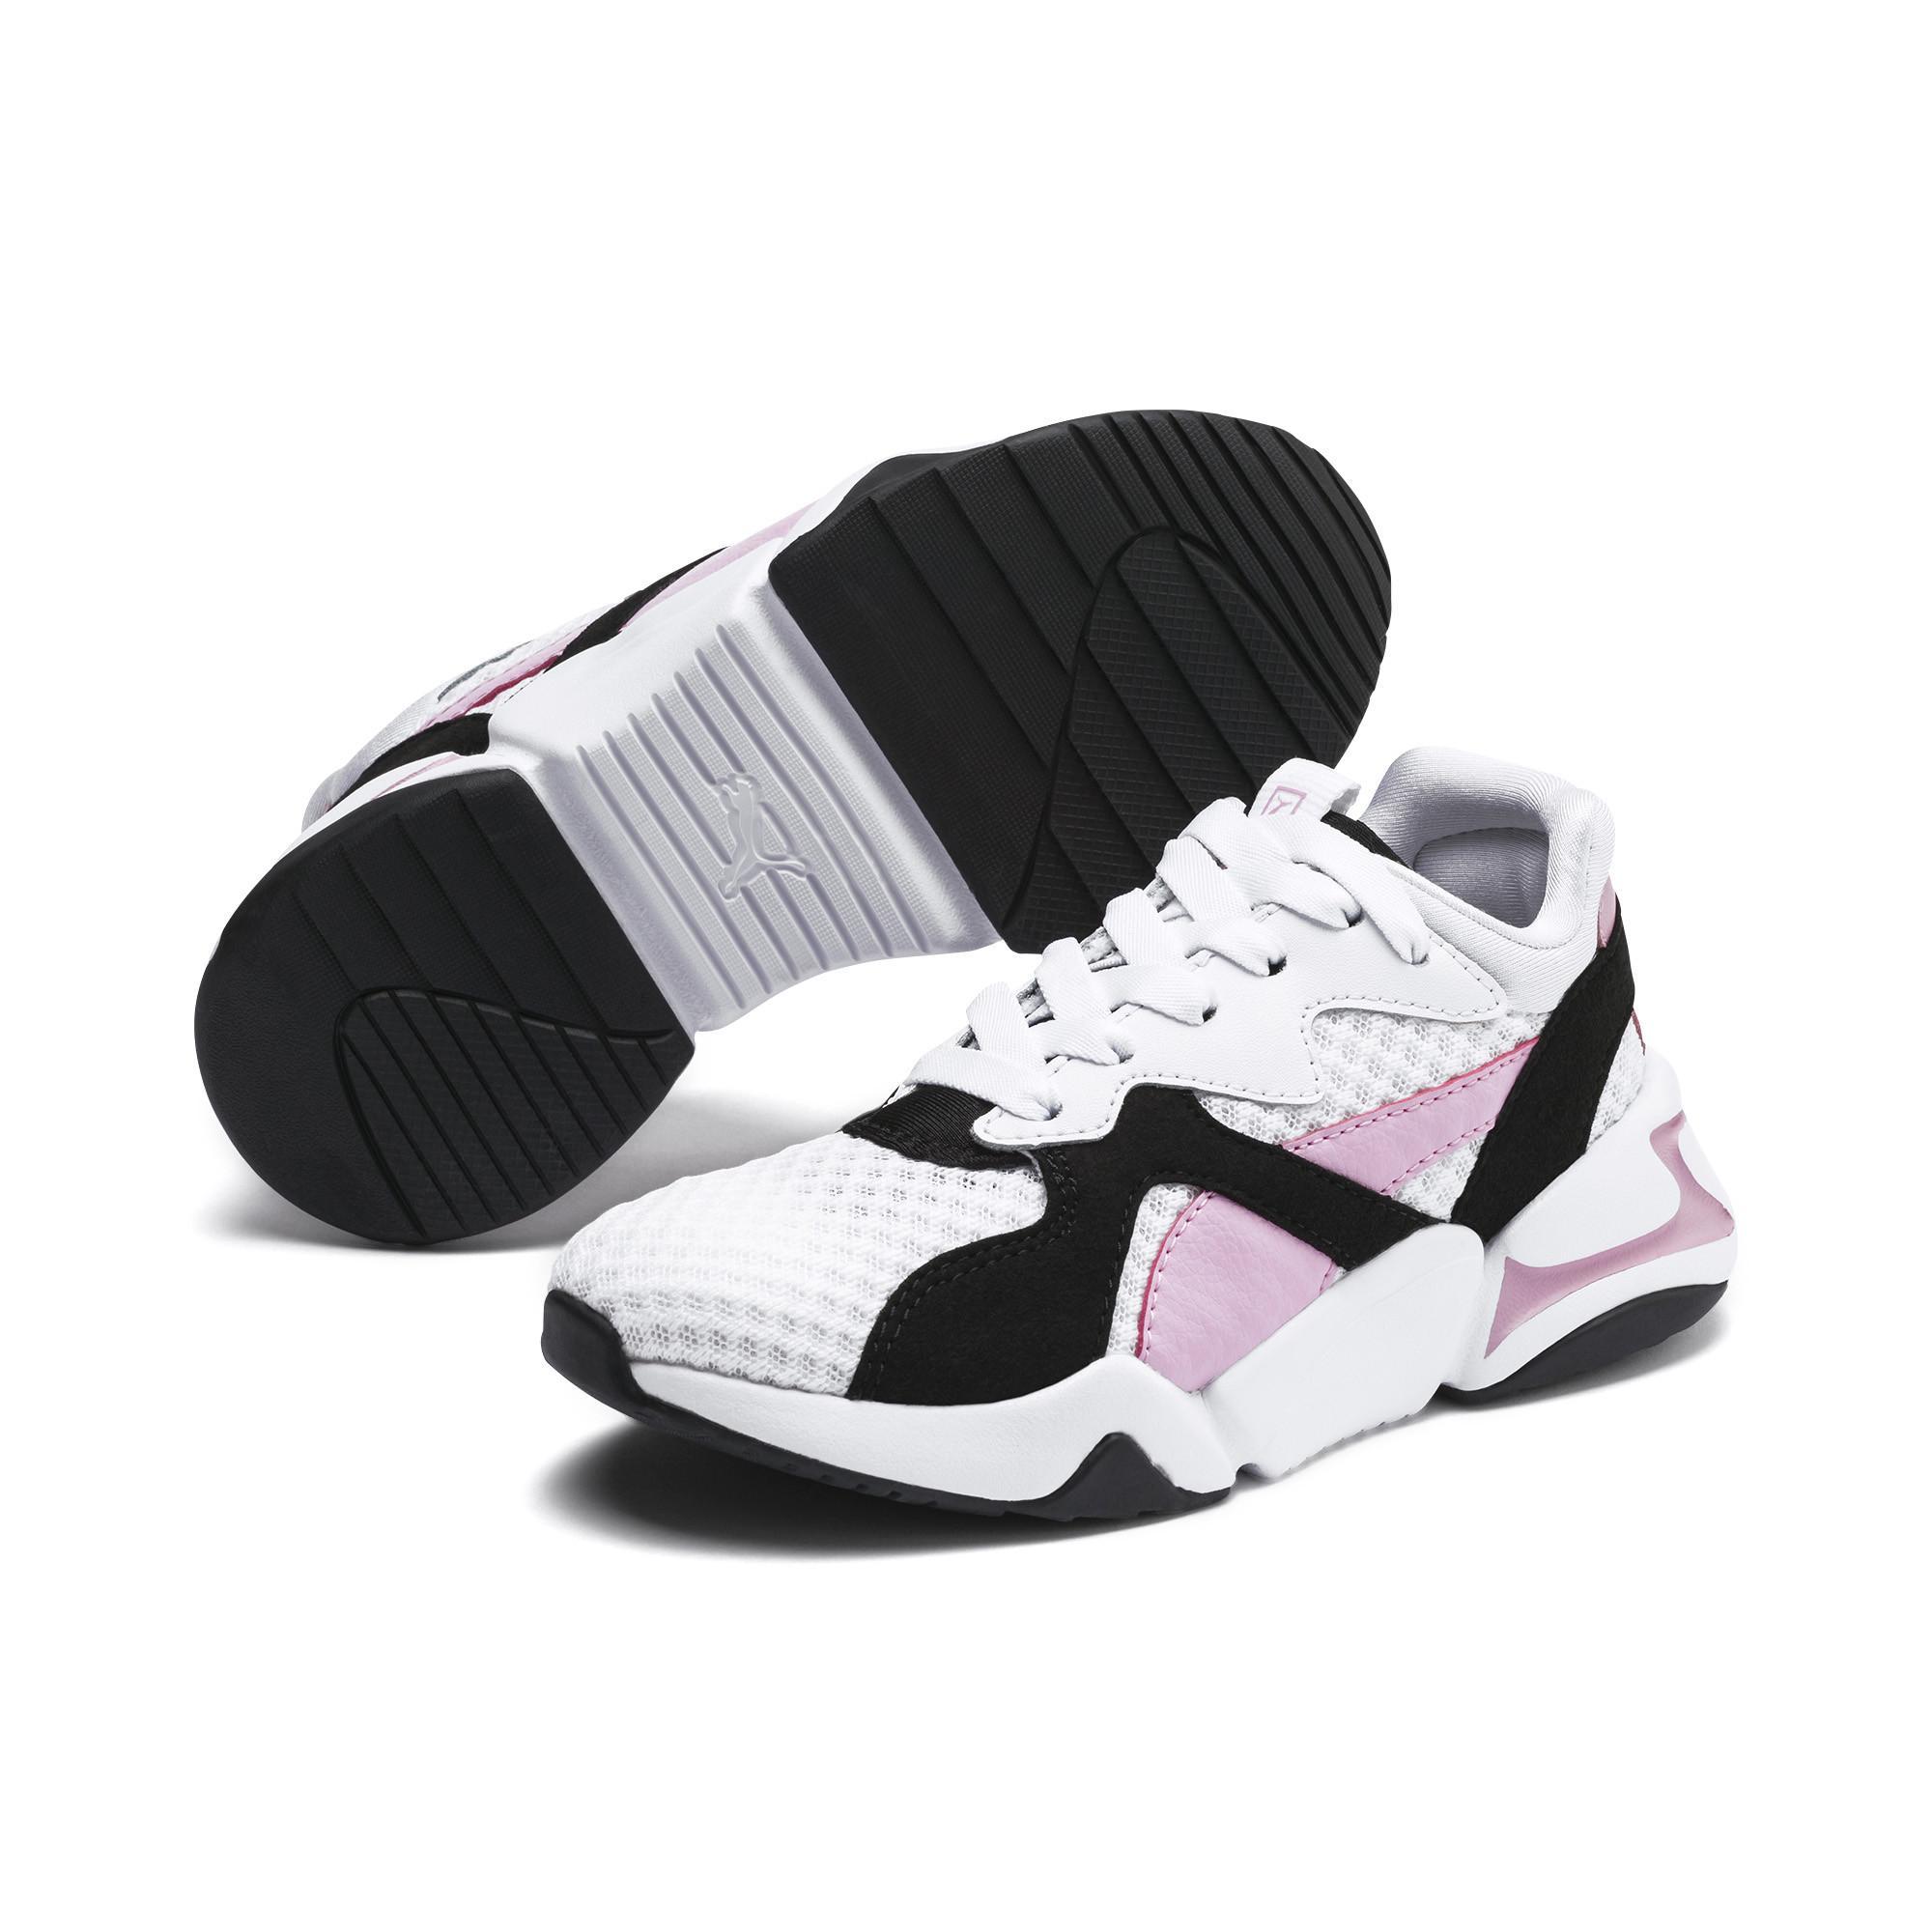 366c0547df39 Lyst - PUMA Nova  90s Bloc Sneakers Ps in Black